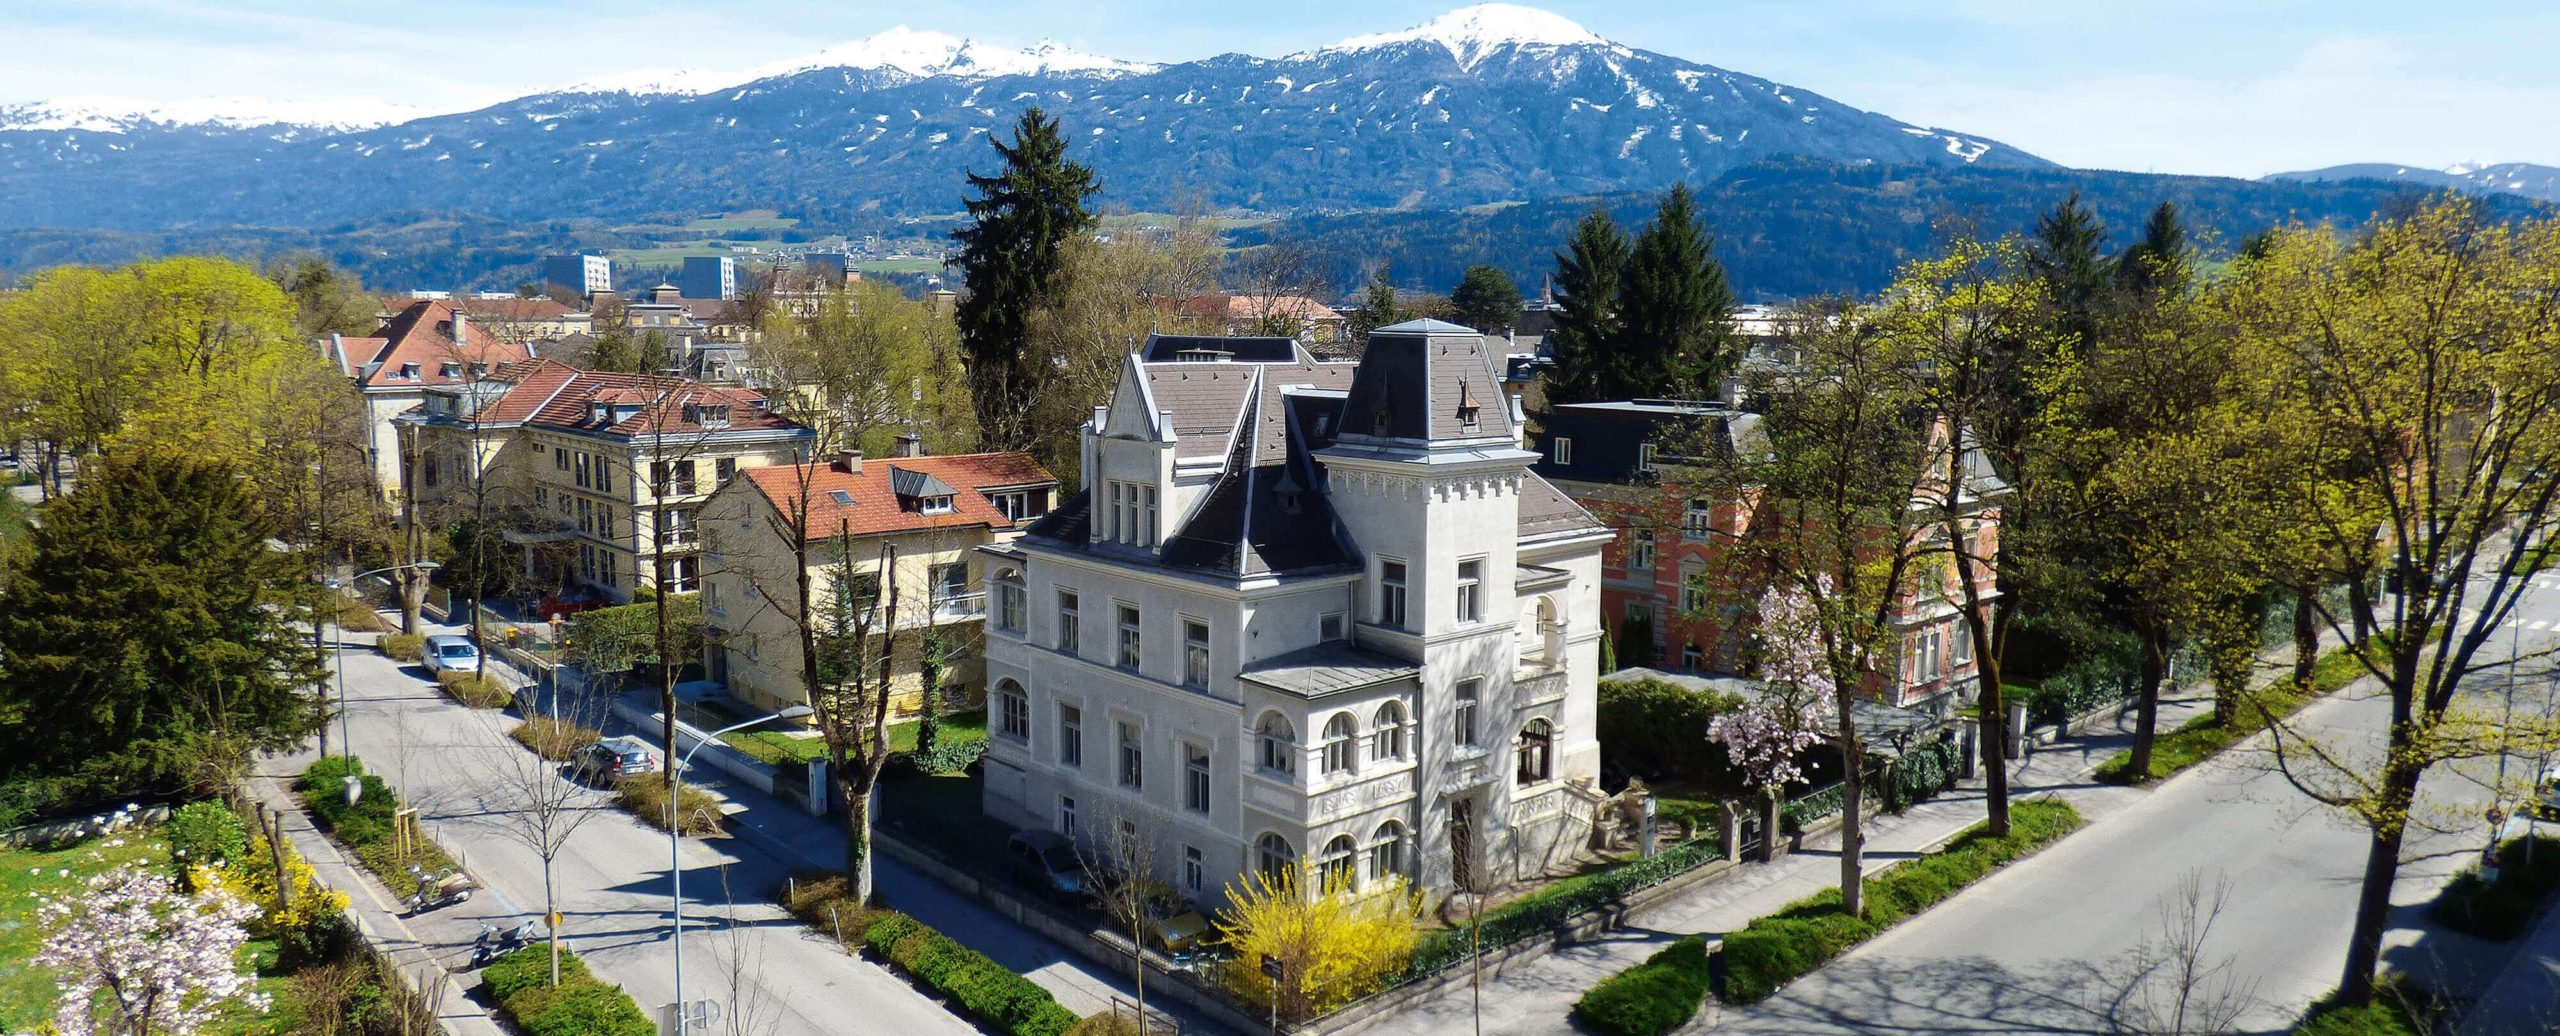 Immobilienbüro Innsbruck